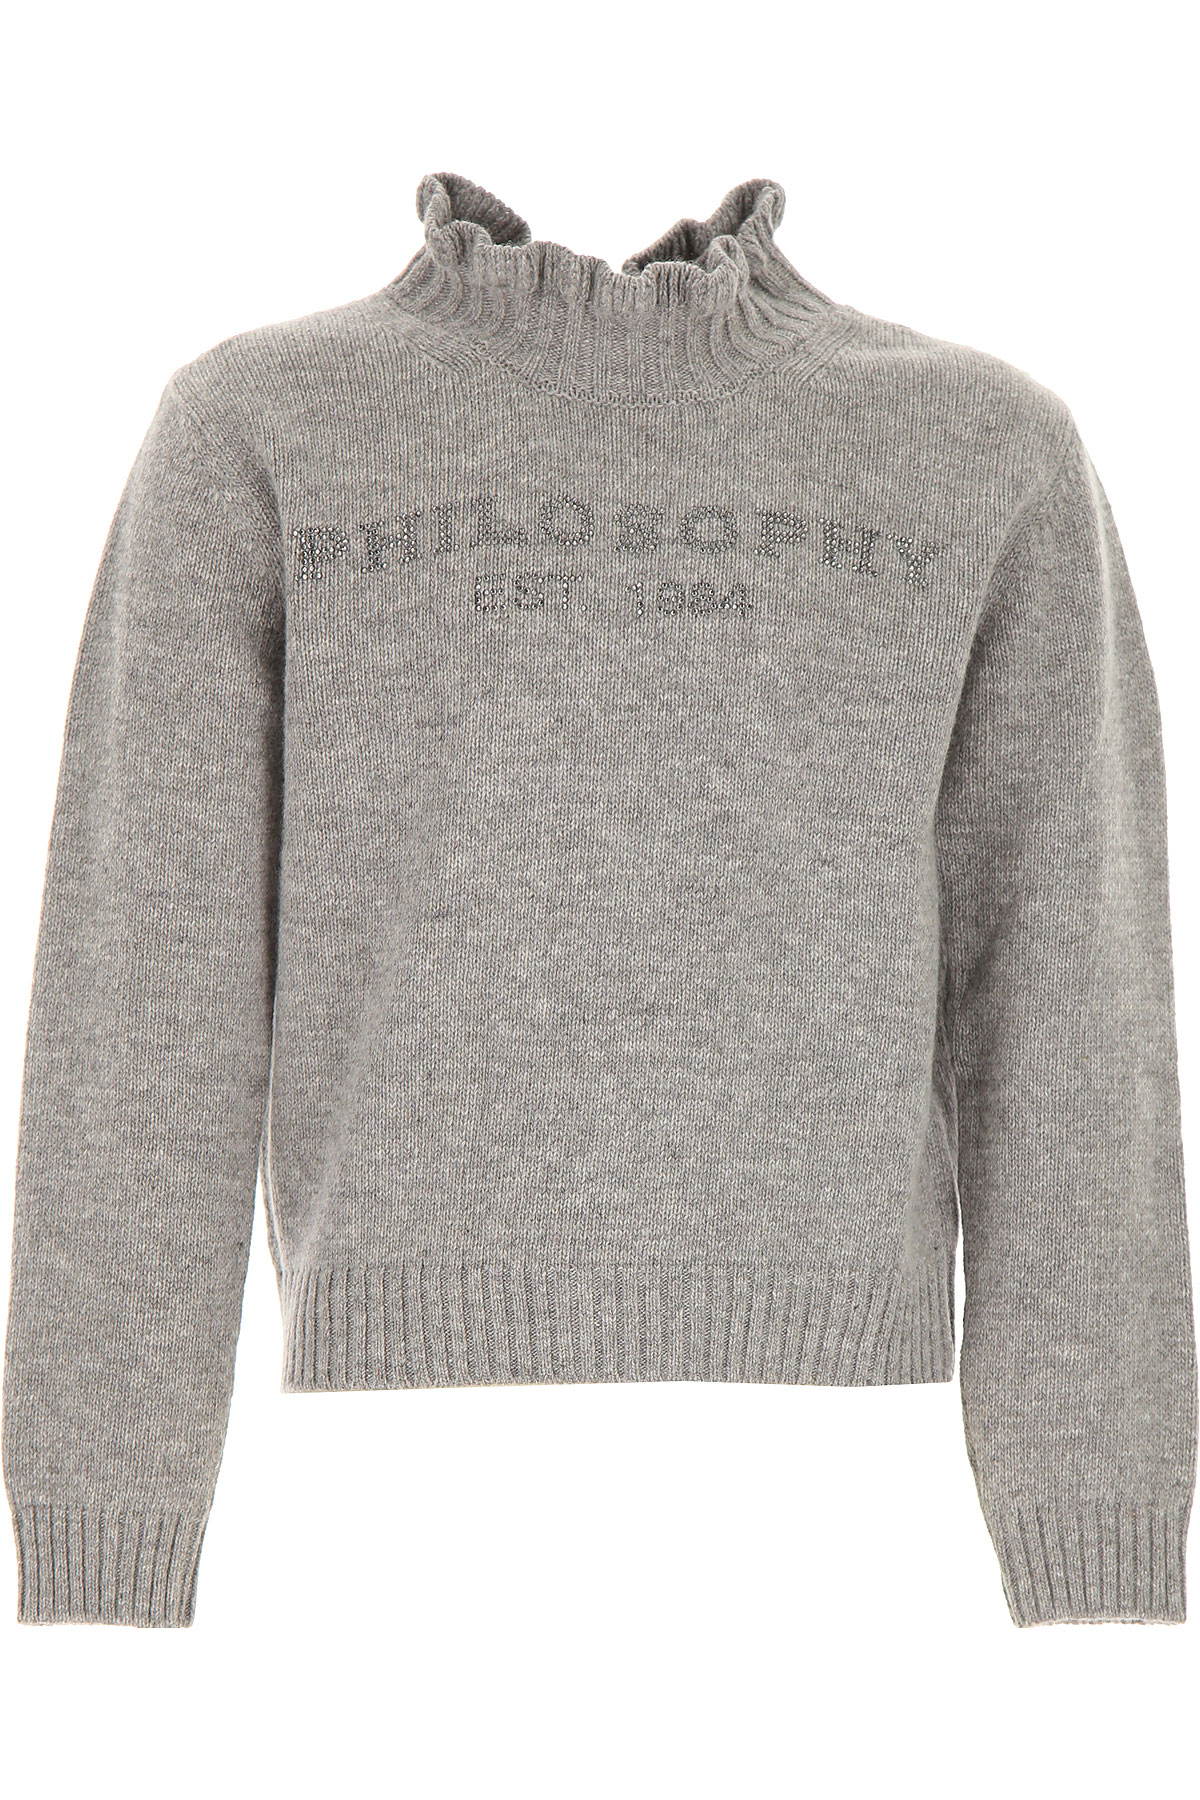 Philosophy di Lorenzo Serafini Kids Sweaters for Girls On Sale, Grey, Merinos Wool, 2019, 6Y XL